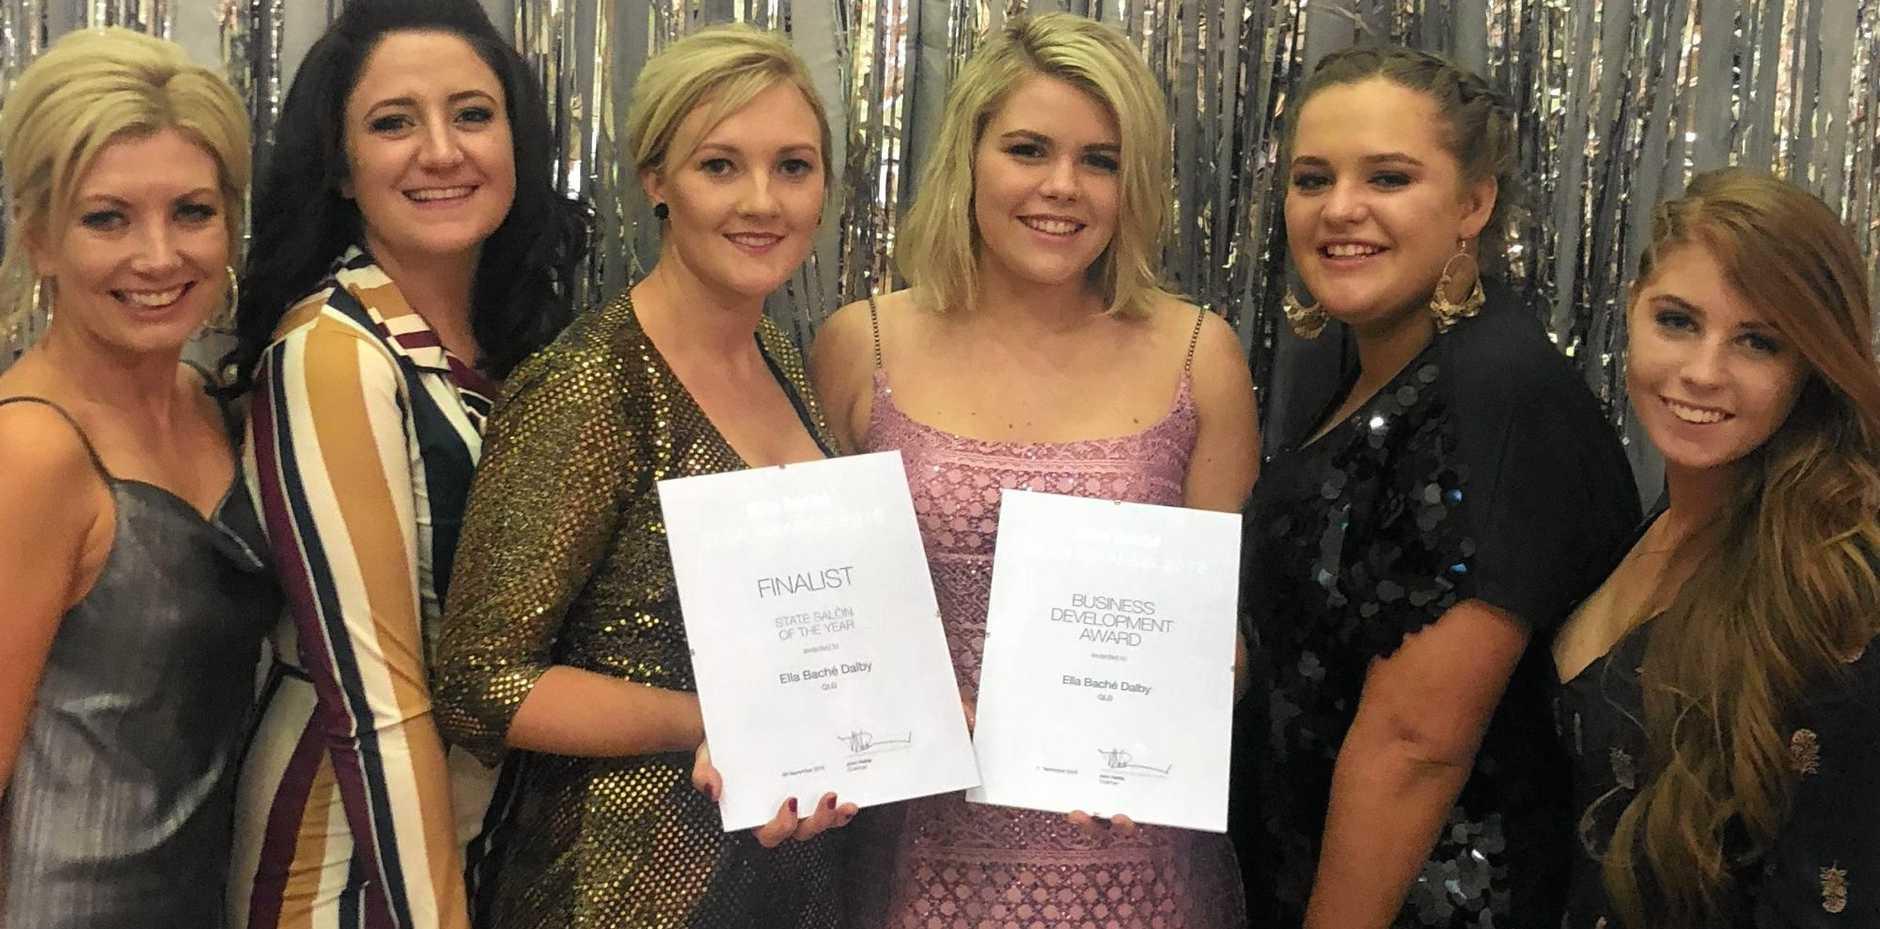 AWARDS NIGHT: Natalie Leis, Sam Burwood, Gemma Lowe, Meg Wilkie, Alexa Goodmanson and Laycee Fermor from Ella bache Dalby, receiving thier accolades last weekend in Sydney.